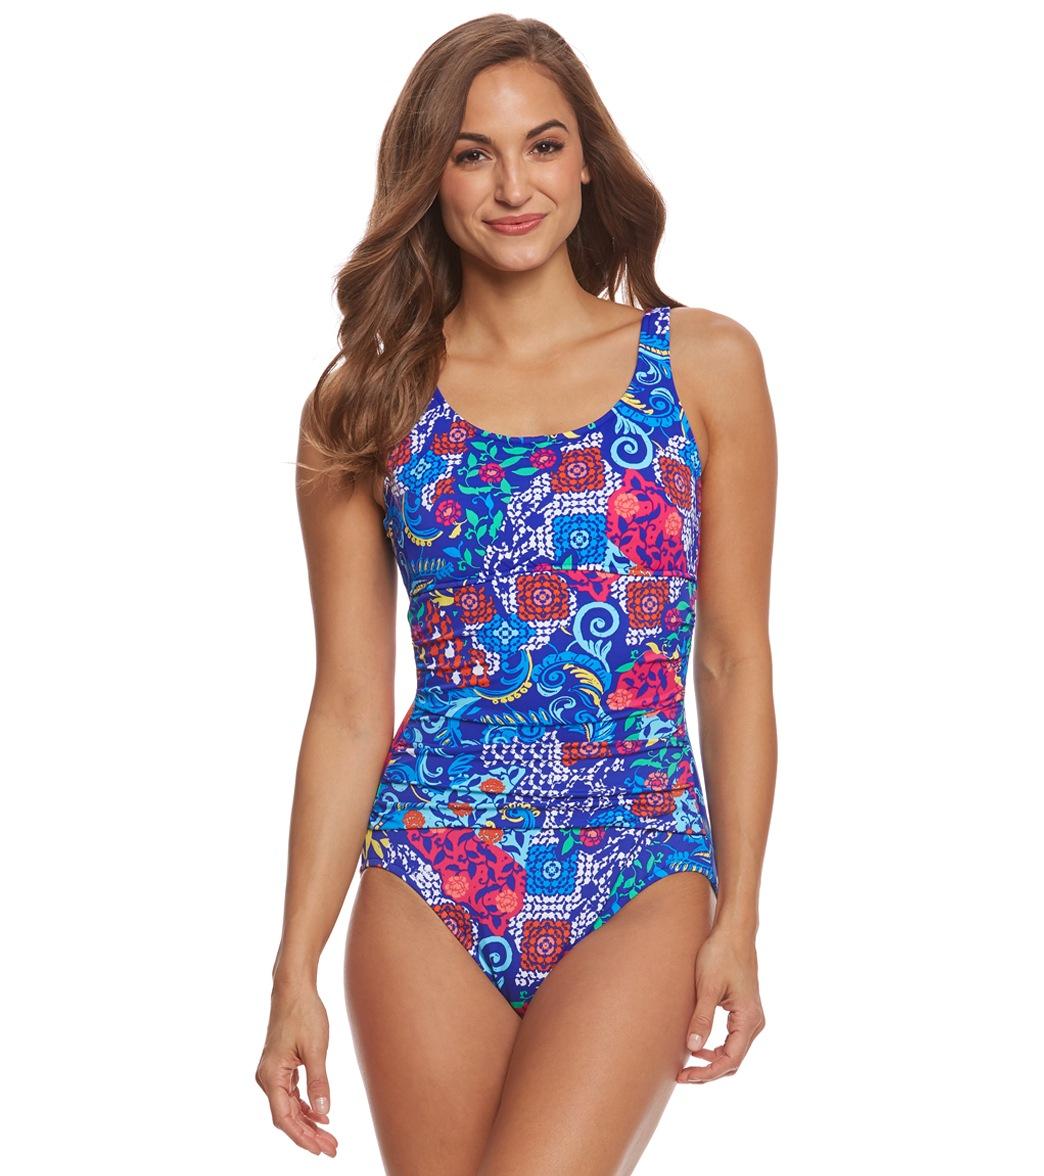 64606fbfebc ... Penbrooke Bali Mastectomy Empire One Piece Swimsuit. Play Video. MODEL  MEASUREMENTS